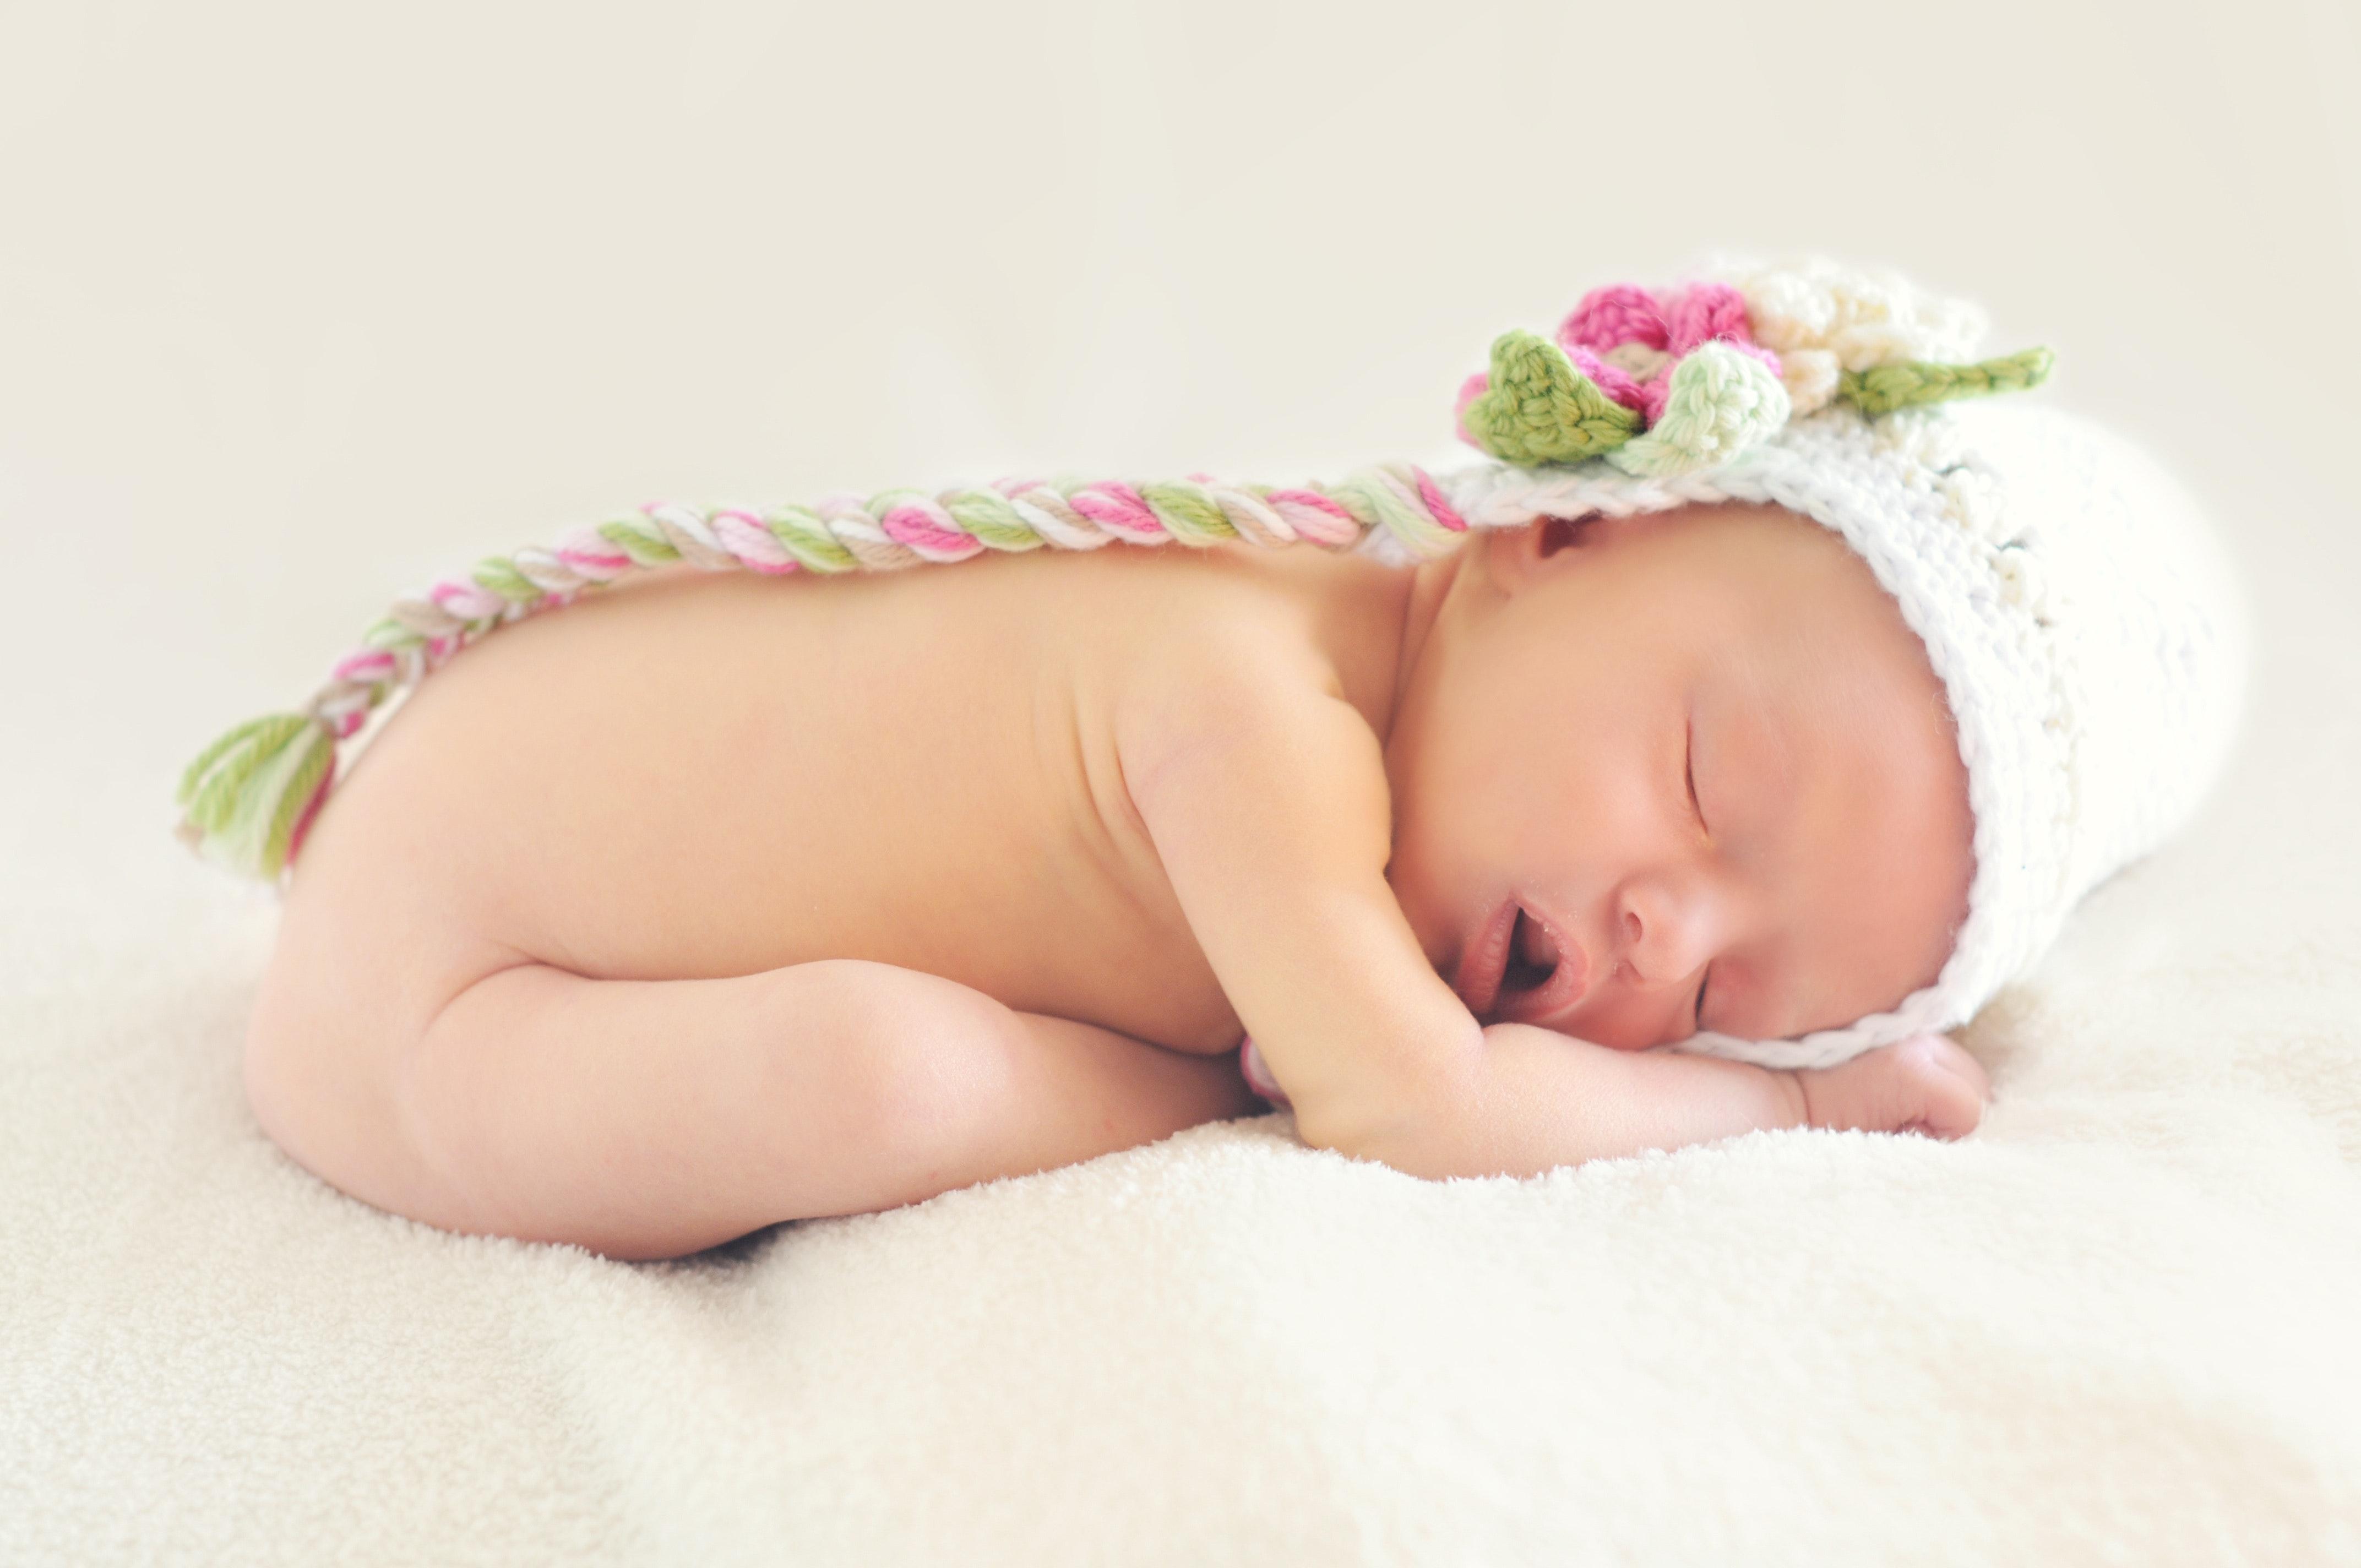 nama bayi perempuan huruf a, nama bayi, nama perempuan dalam islam, maksud nama bayi perempuan, nama bayi perempuan